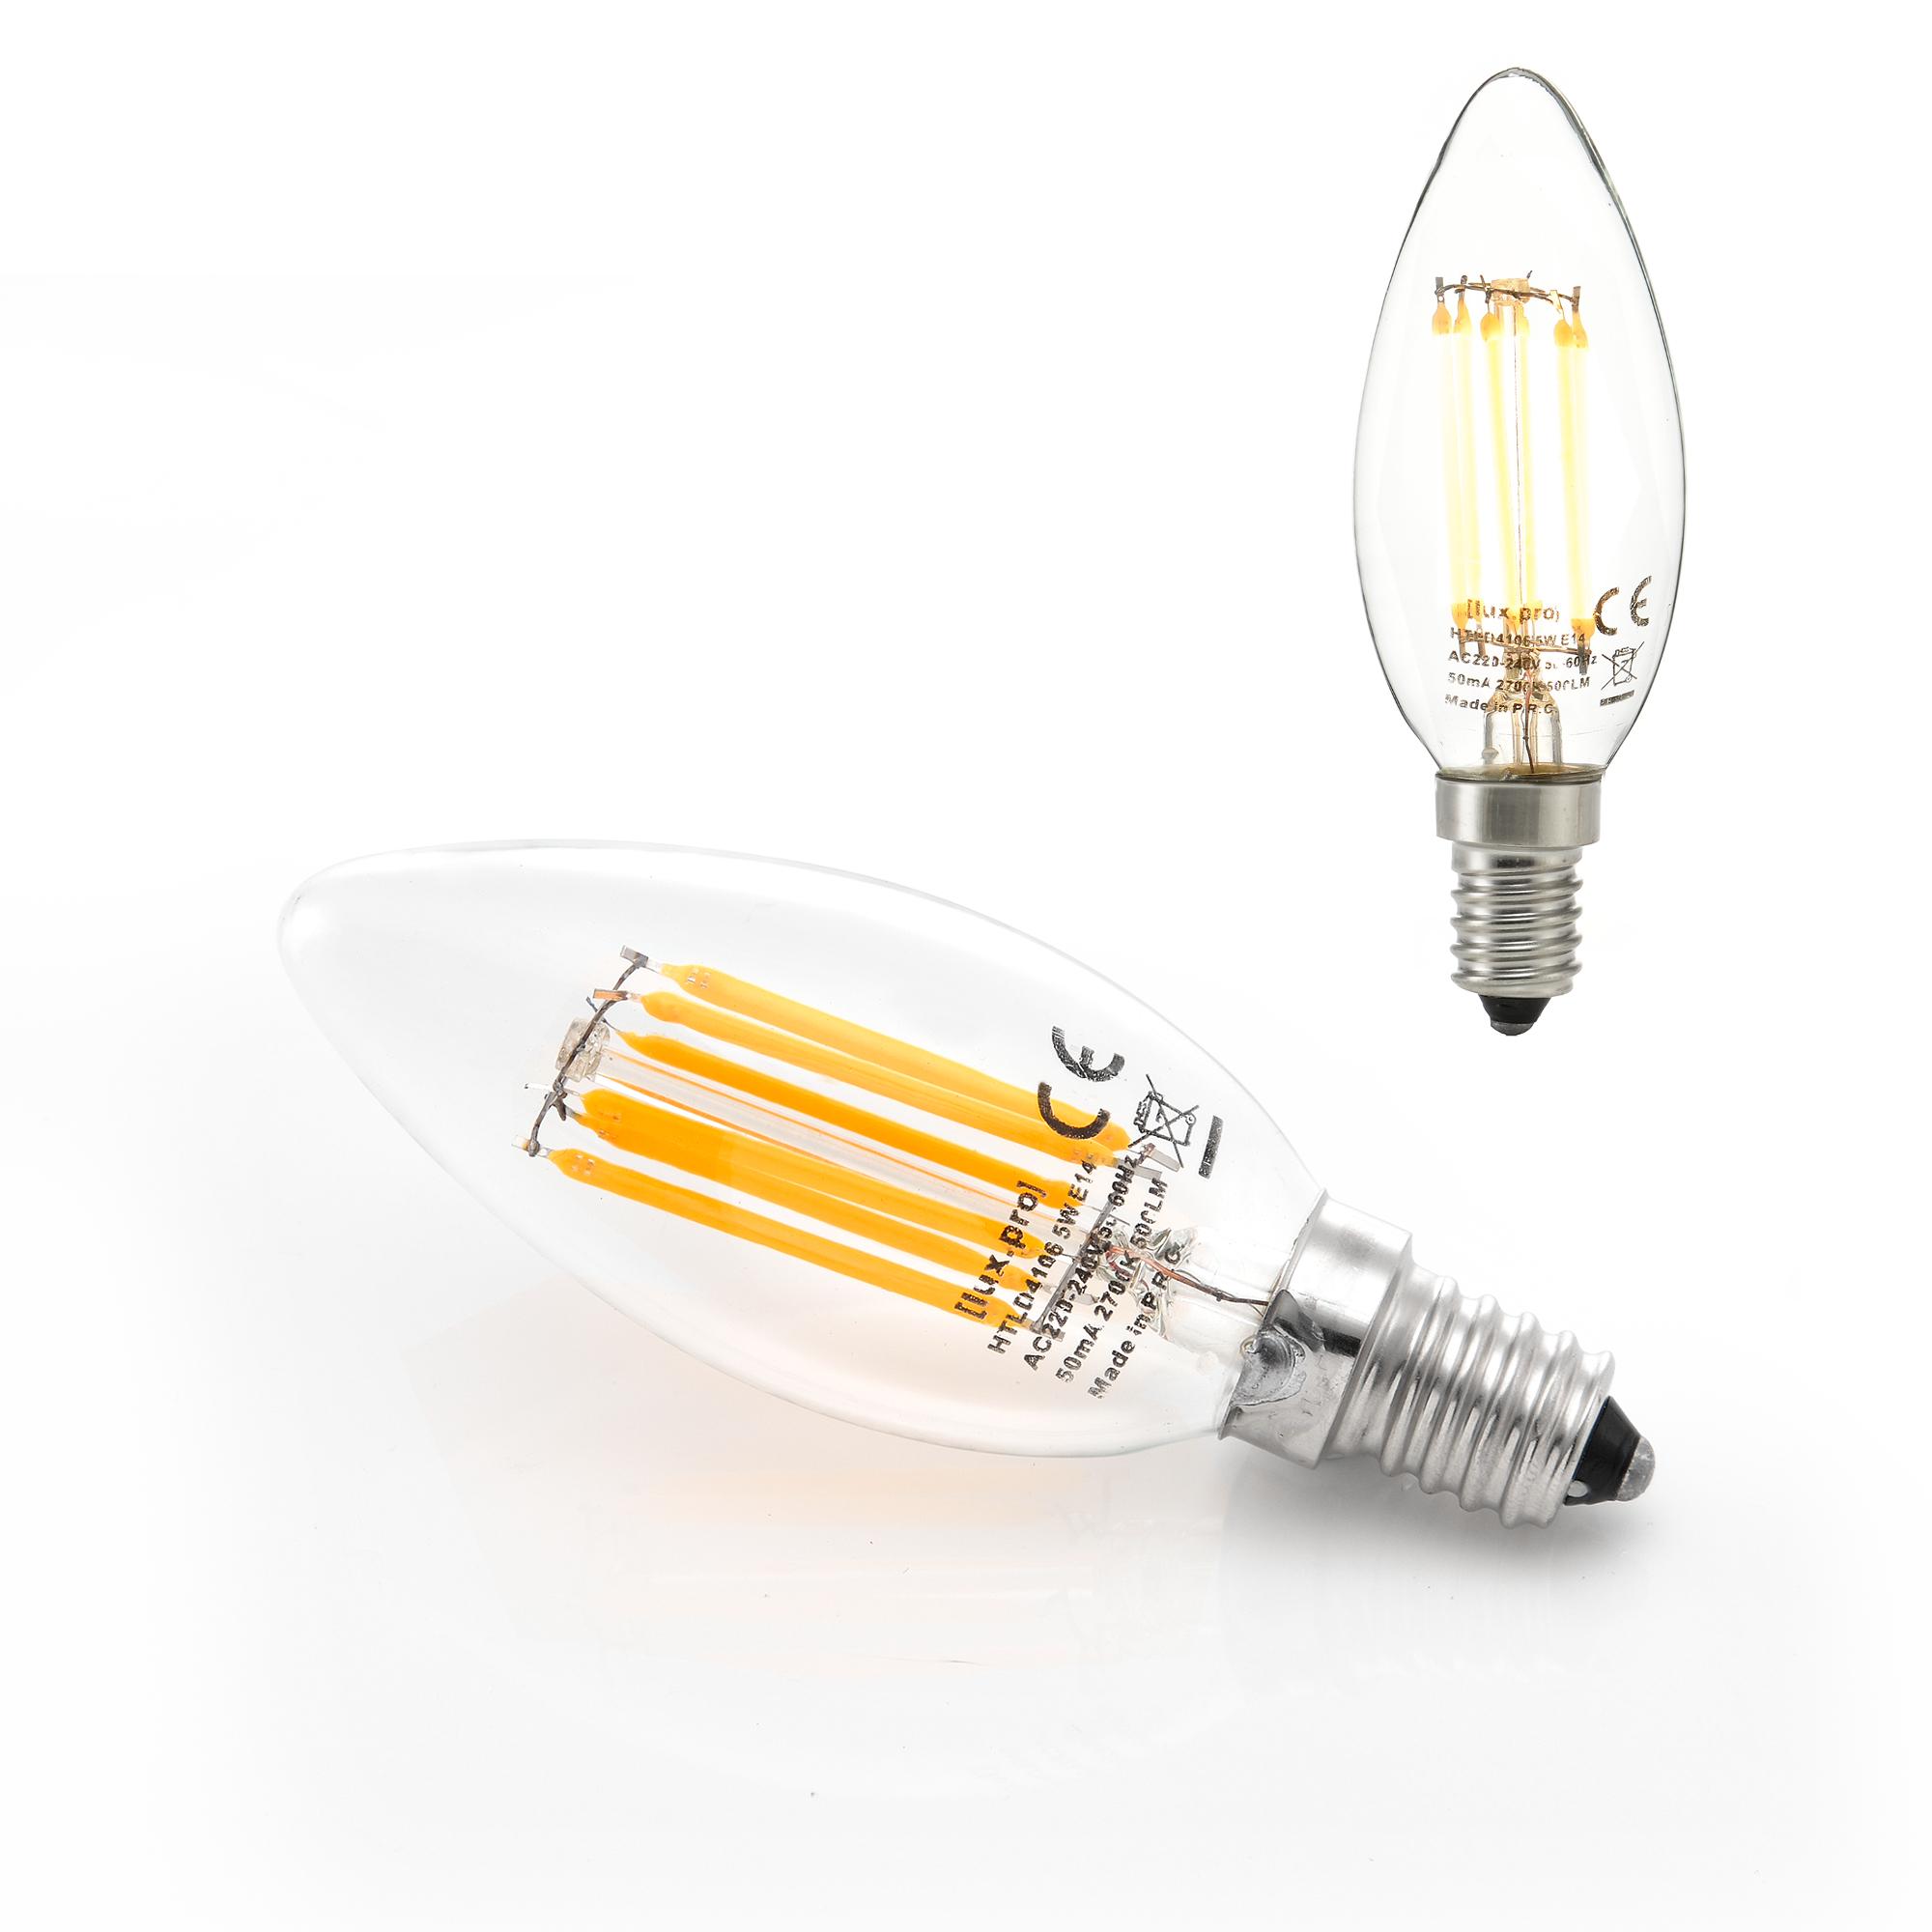 10x led e14 warmwei filament leuchtmittel. Black Bedroom Furniture Sets. Home Design Ideas